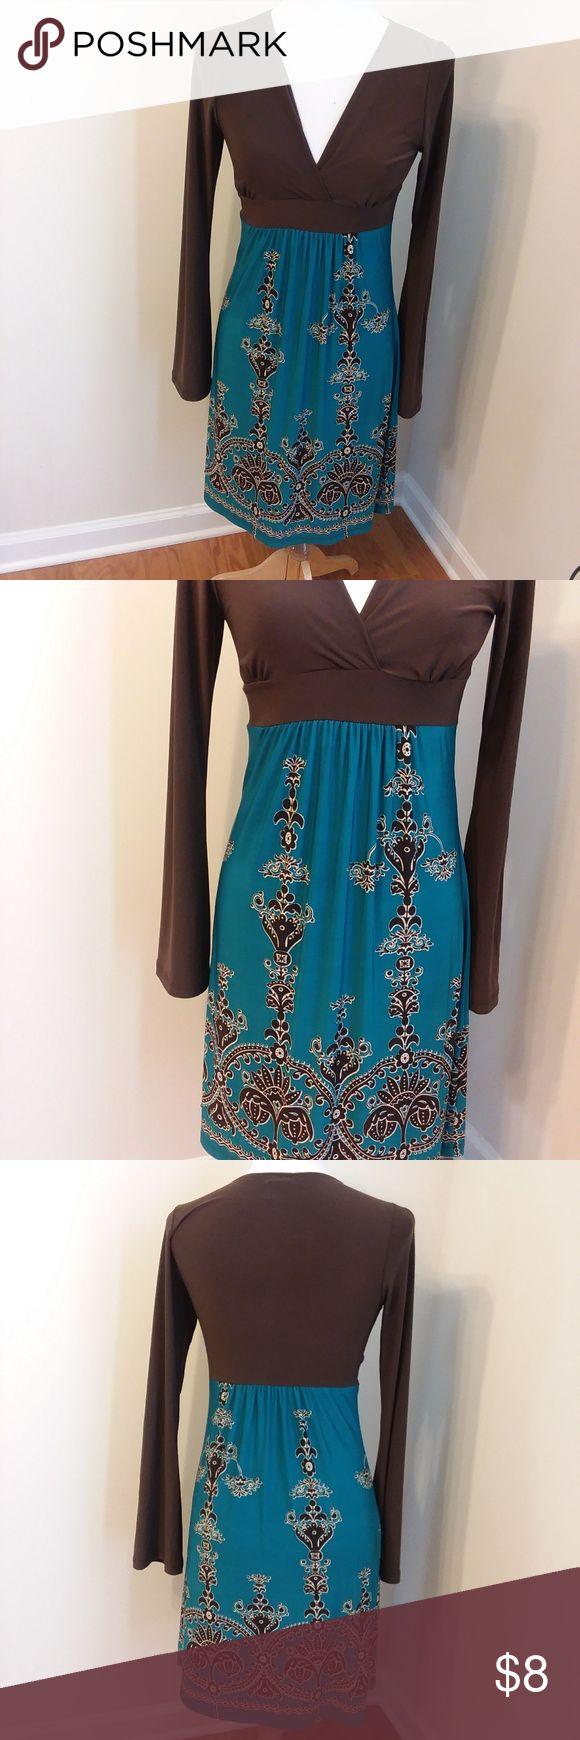 Body Central Dress Slinky v neck dress with long bell sleeves Body Central Dresses Midi